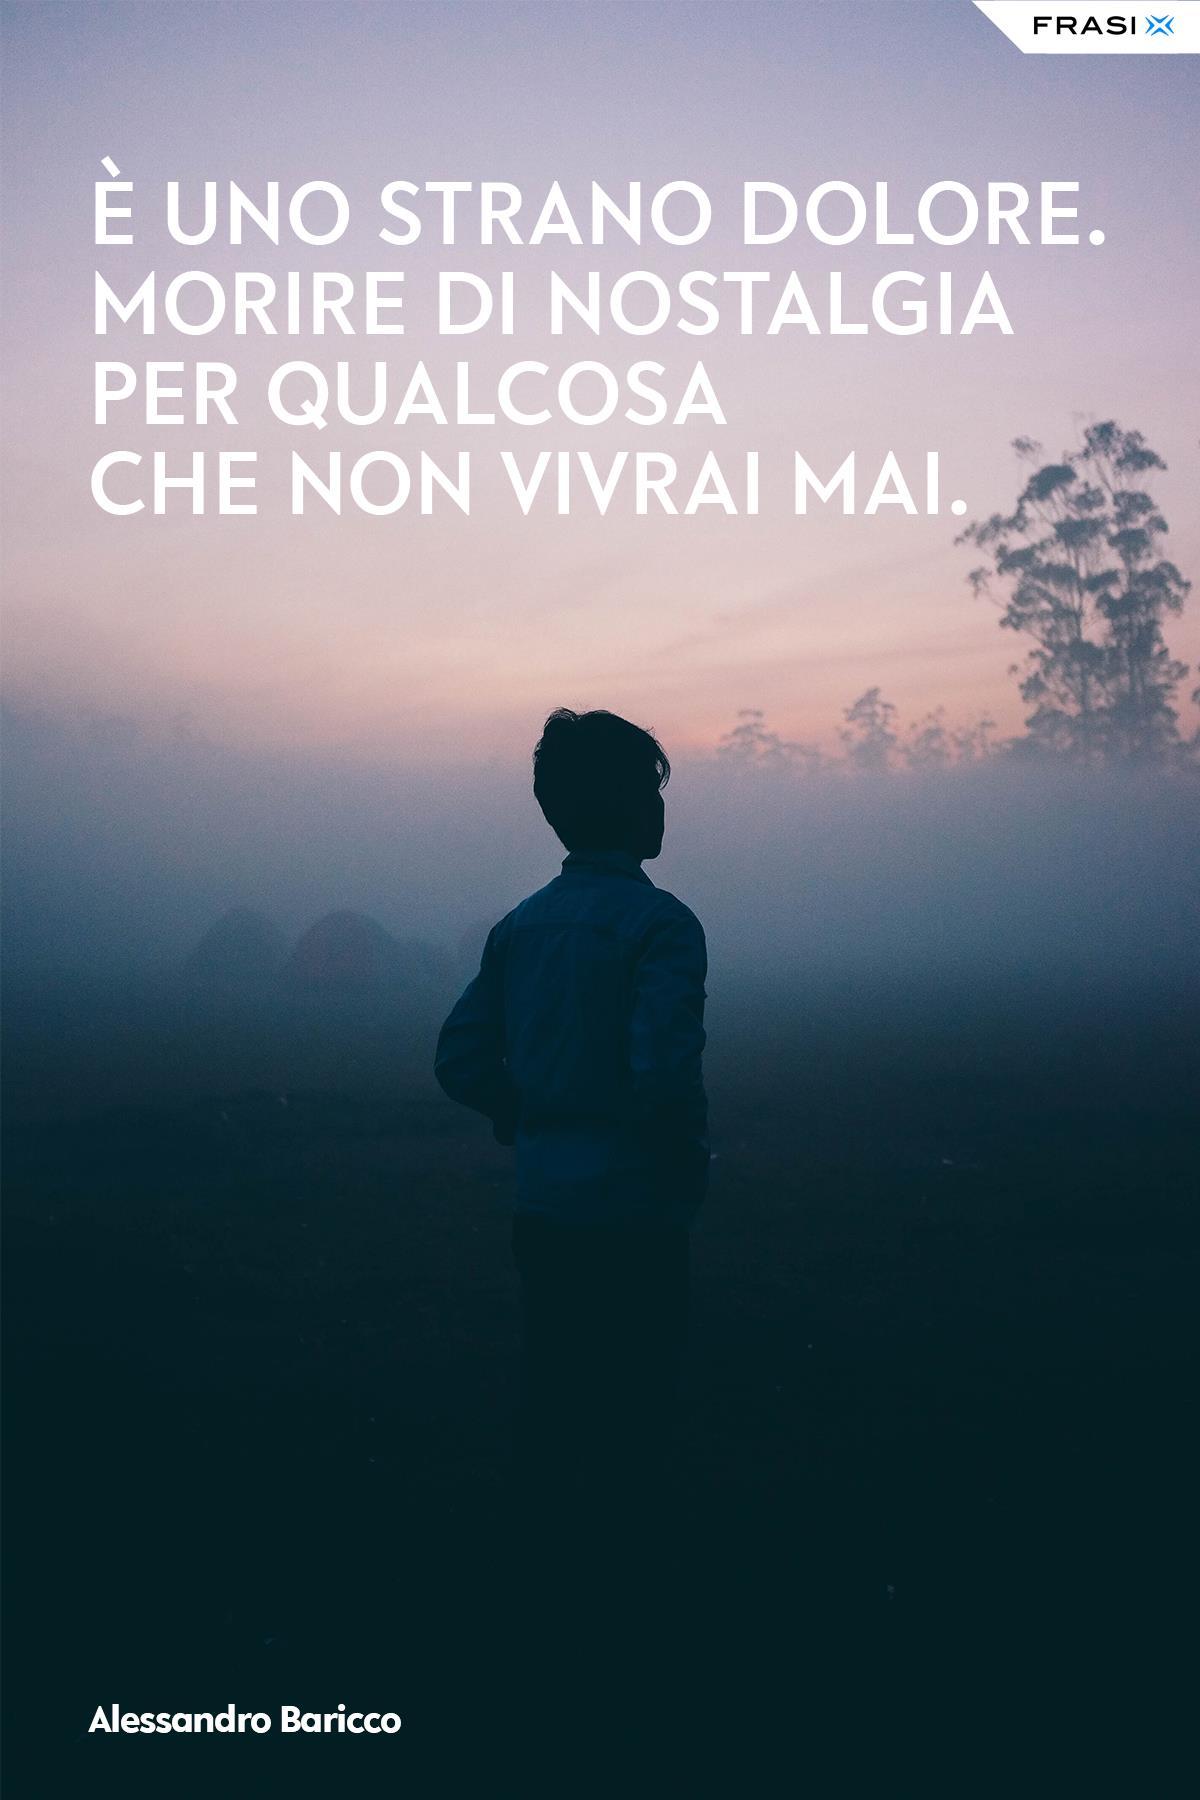 Frasi tristi e depresse Alessandro Baricco